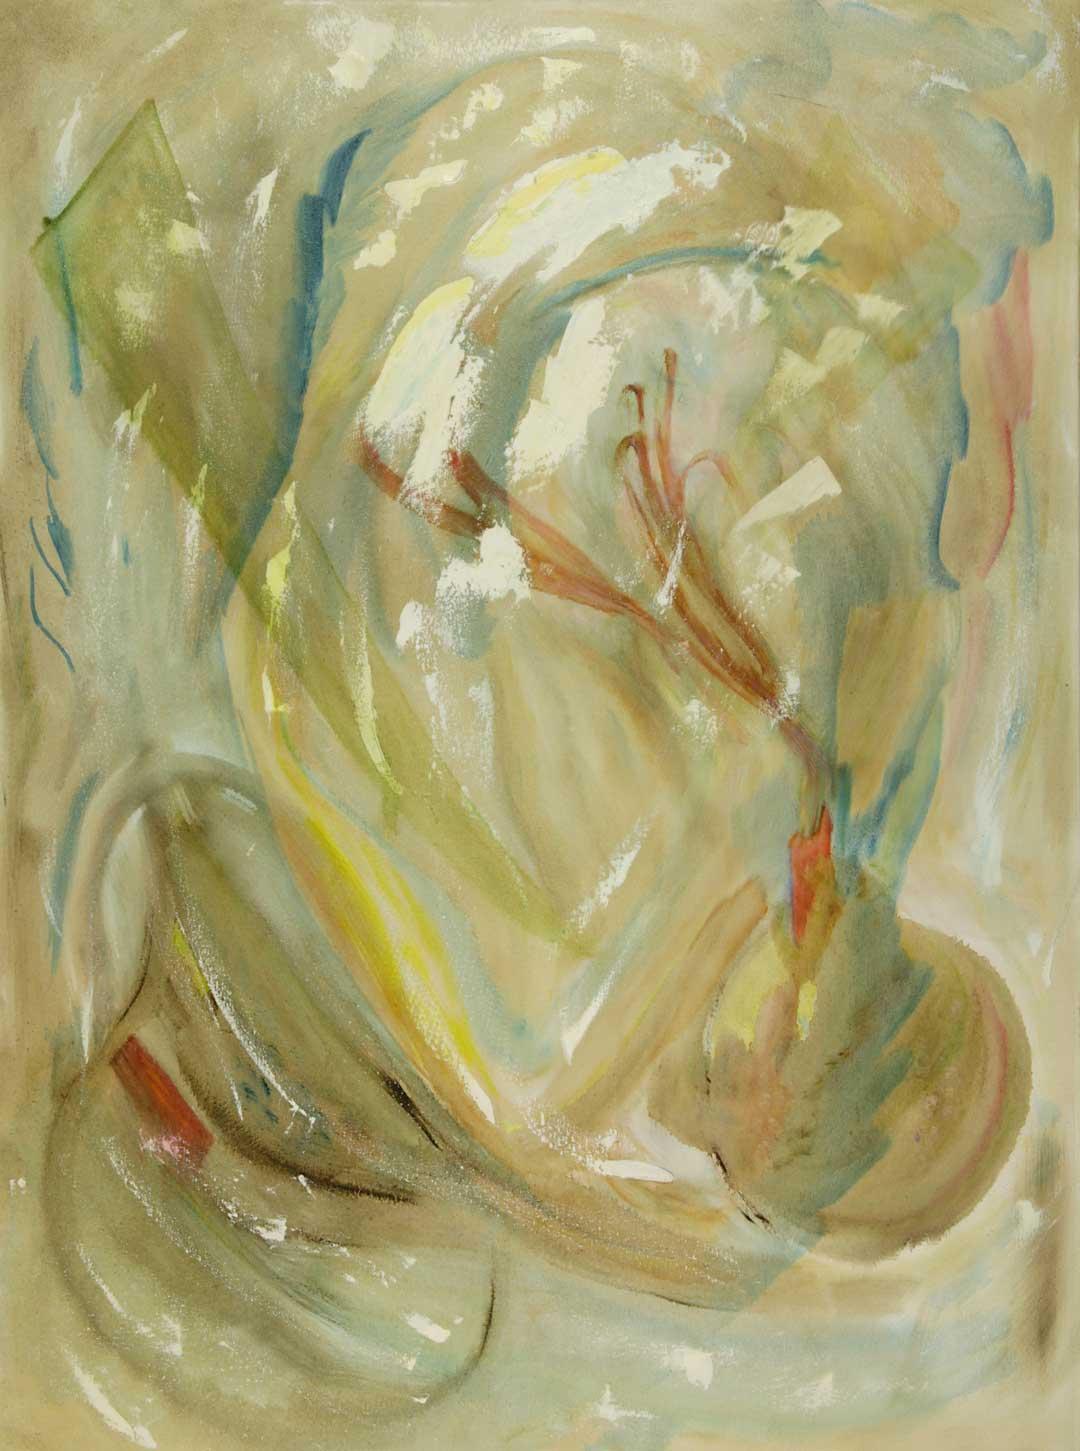 God's Work - Weeping Woman - Karen Wolfram